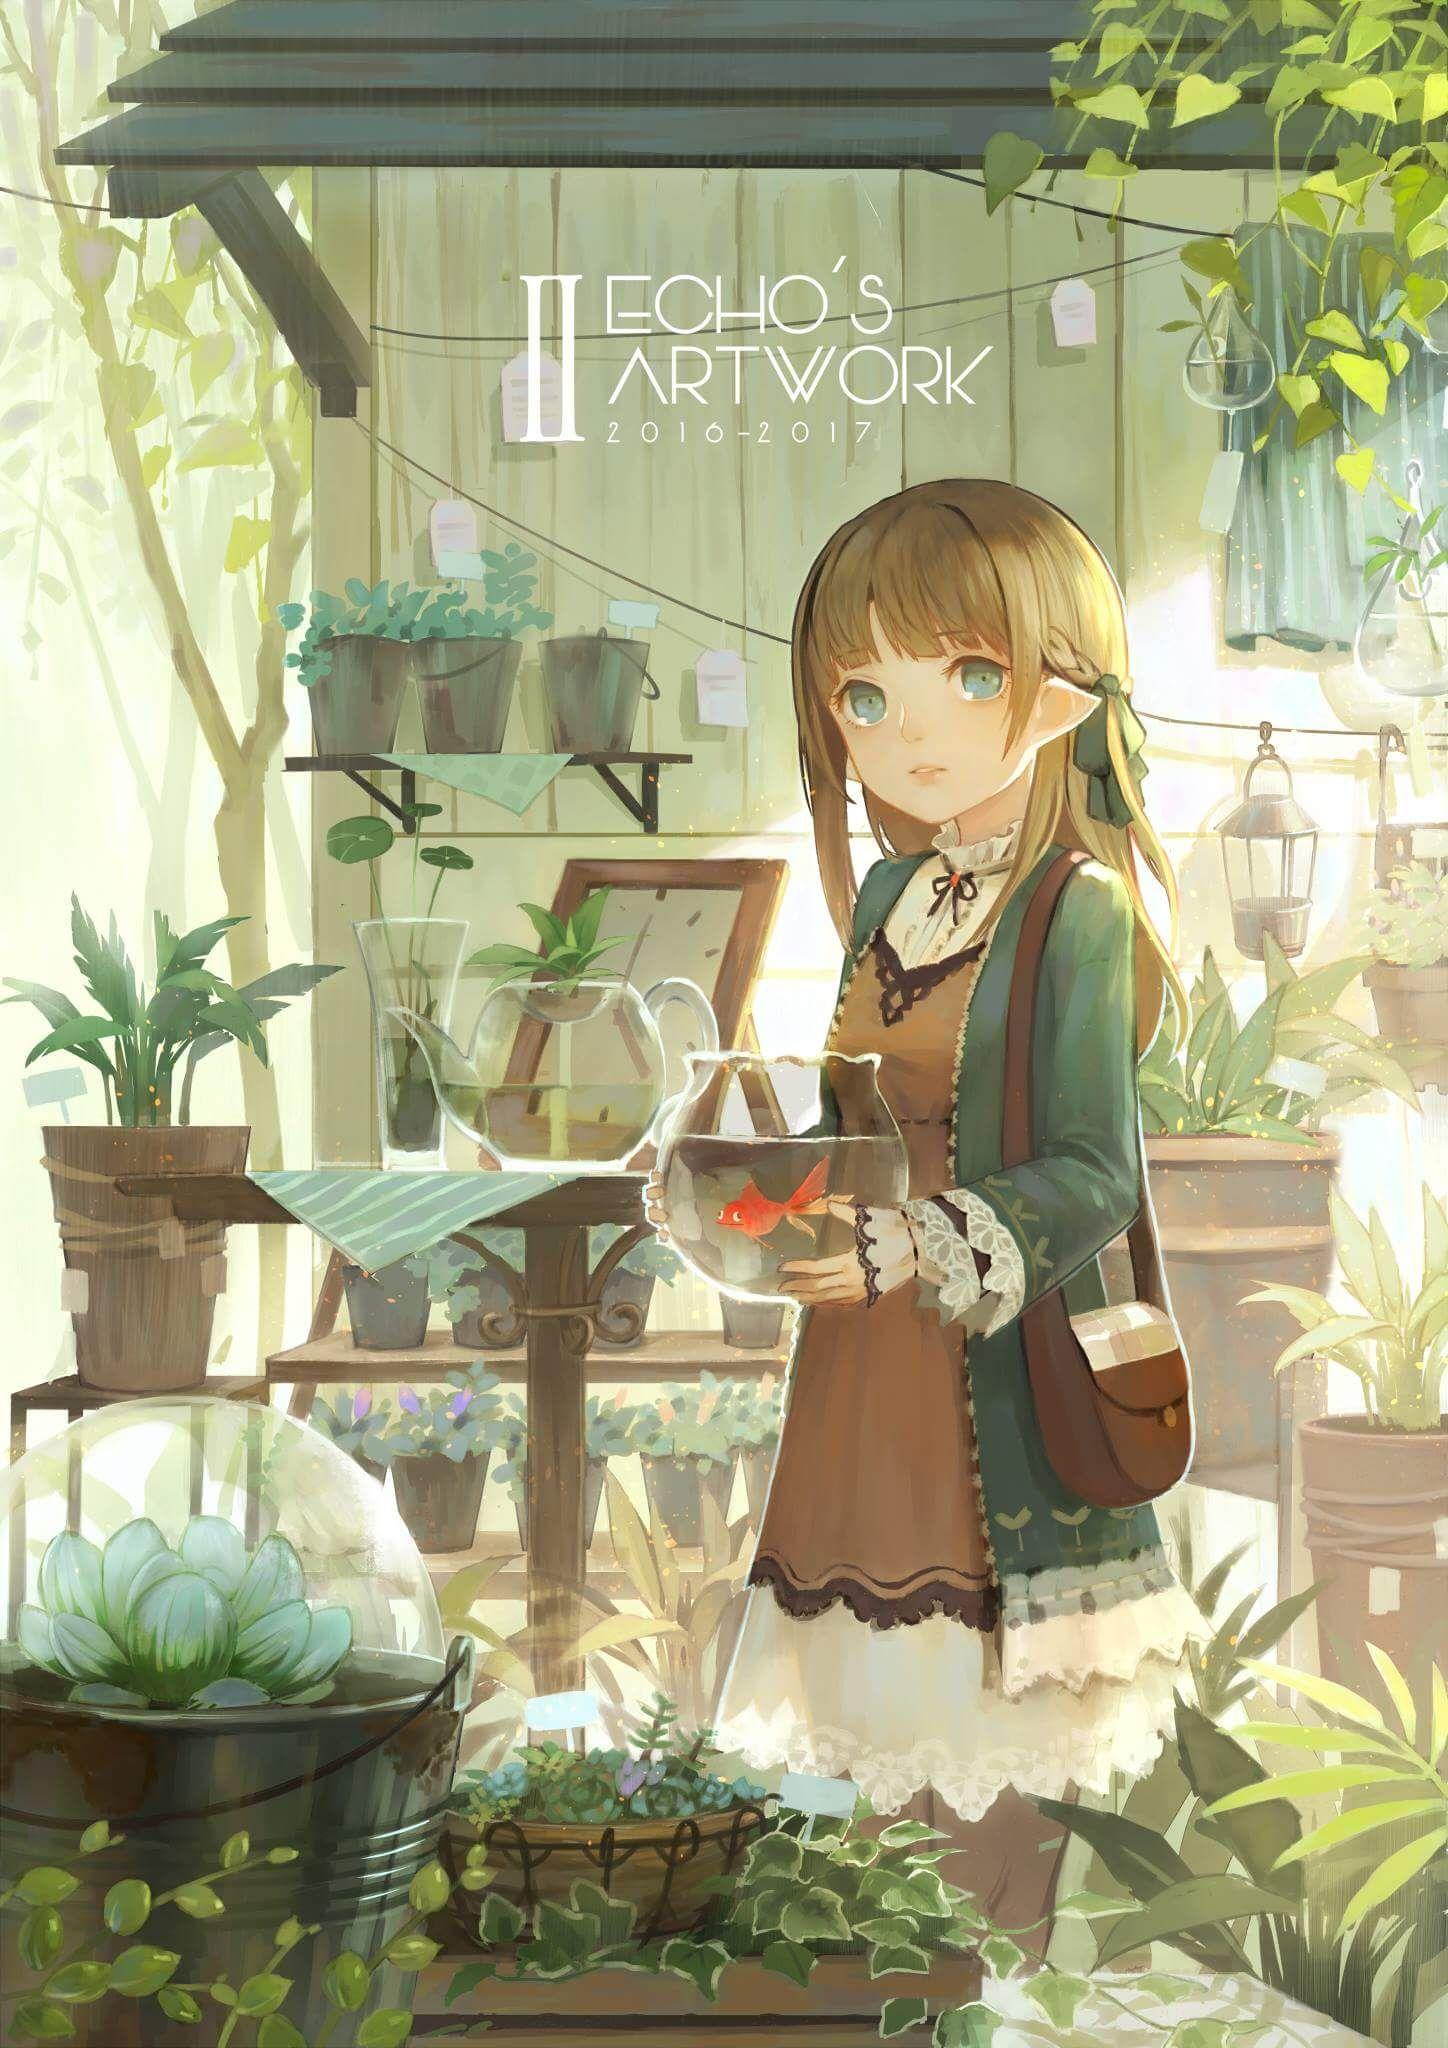 Pin by Byakko on Anime Girls Anime art, Anime scenery